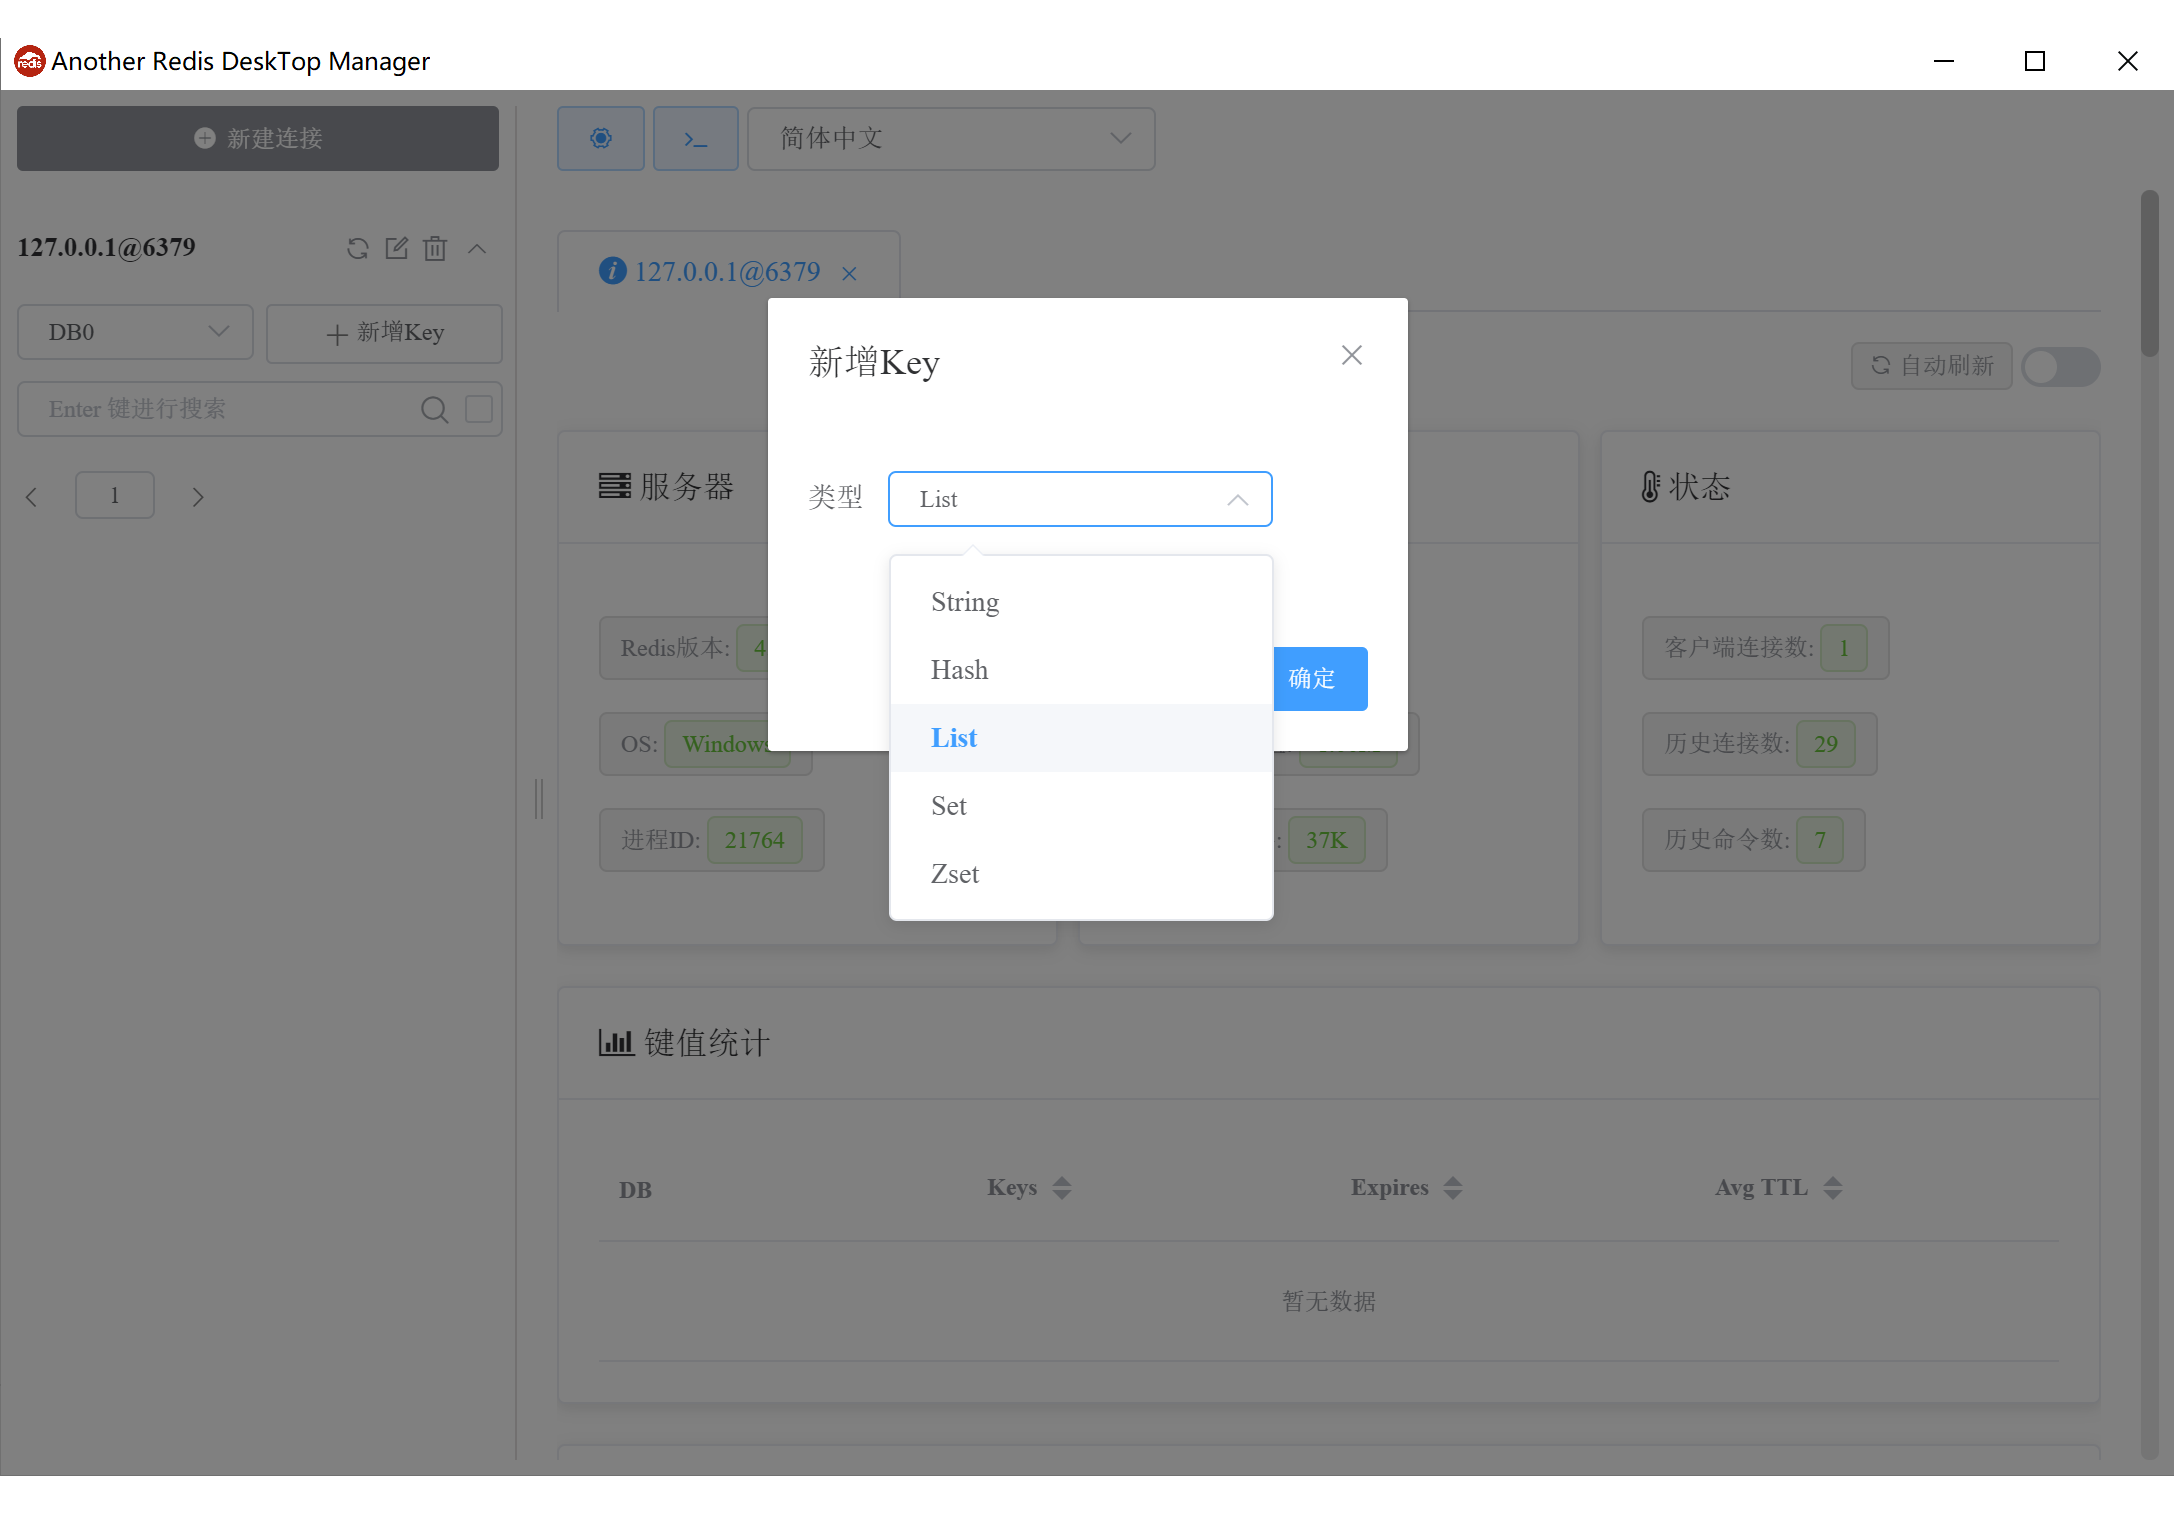 Redis 可视化客户端管理工具